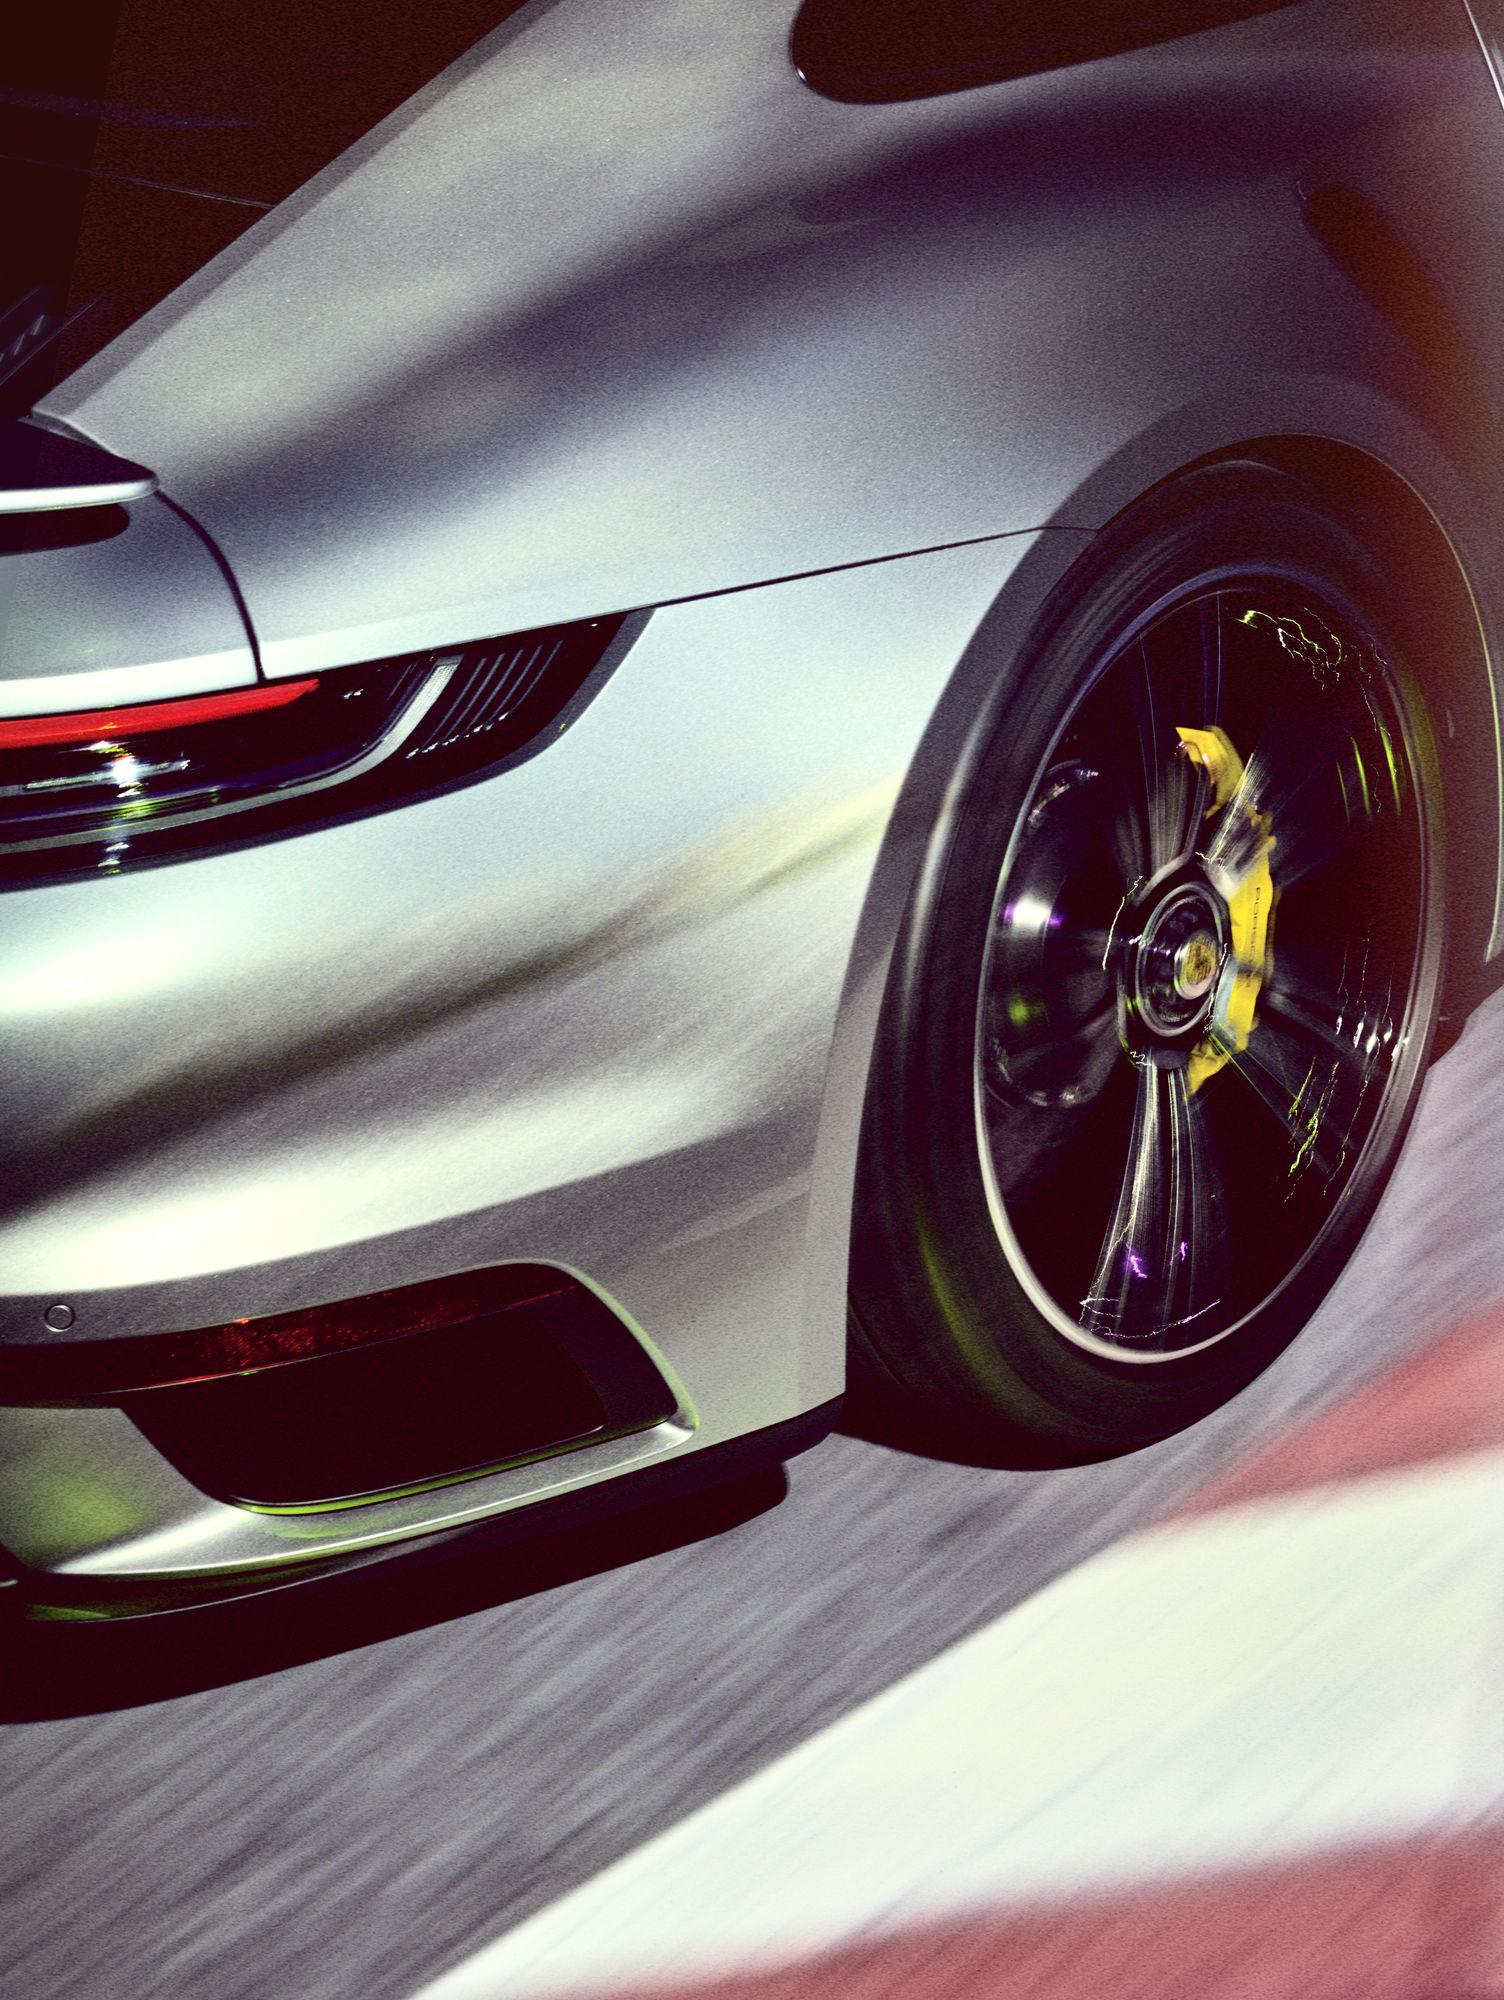 IGOR PANITZ: Porsche 992 Turbo for Christophorus Magazine